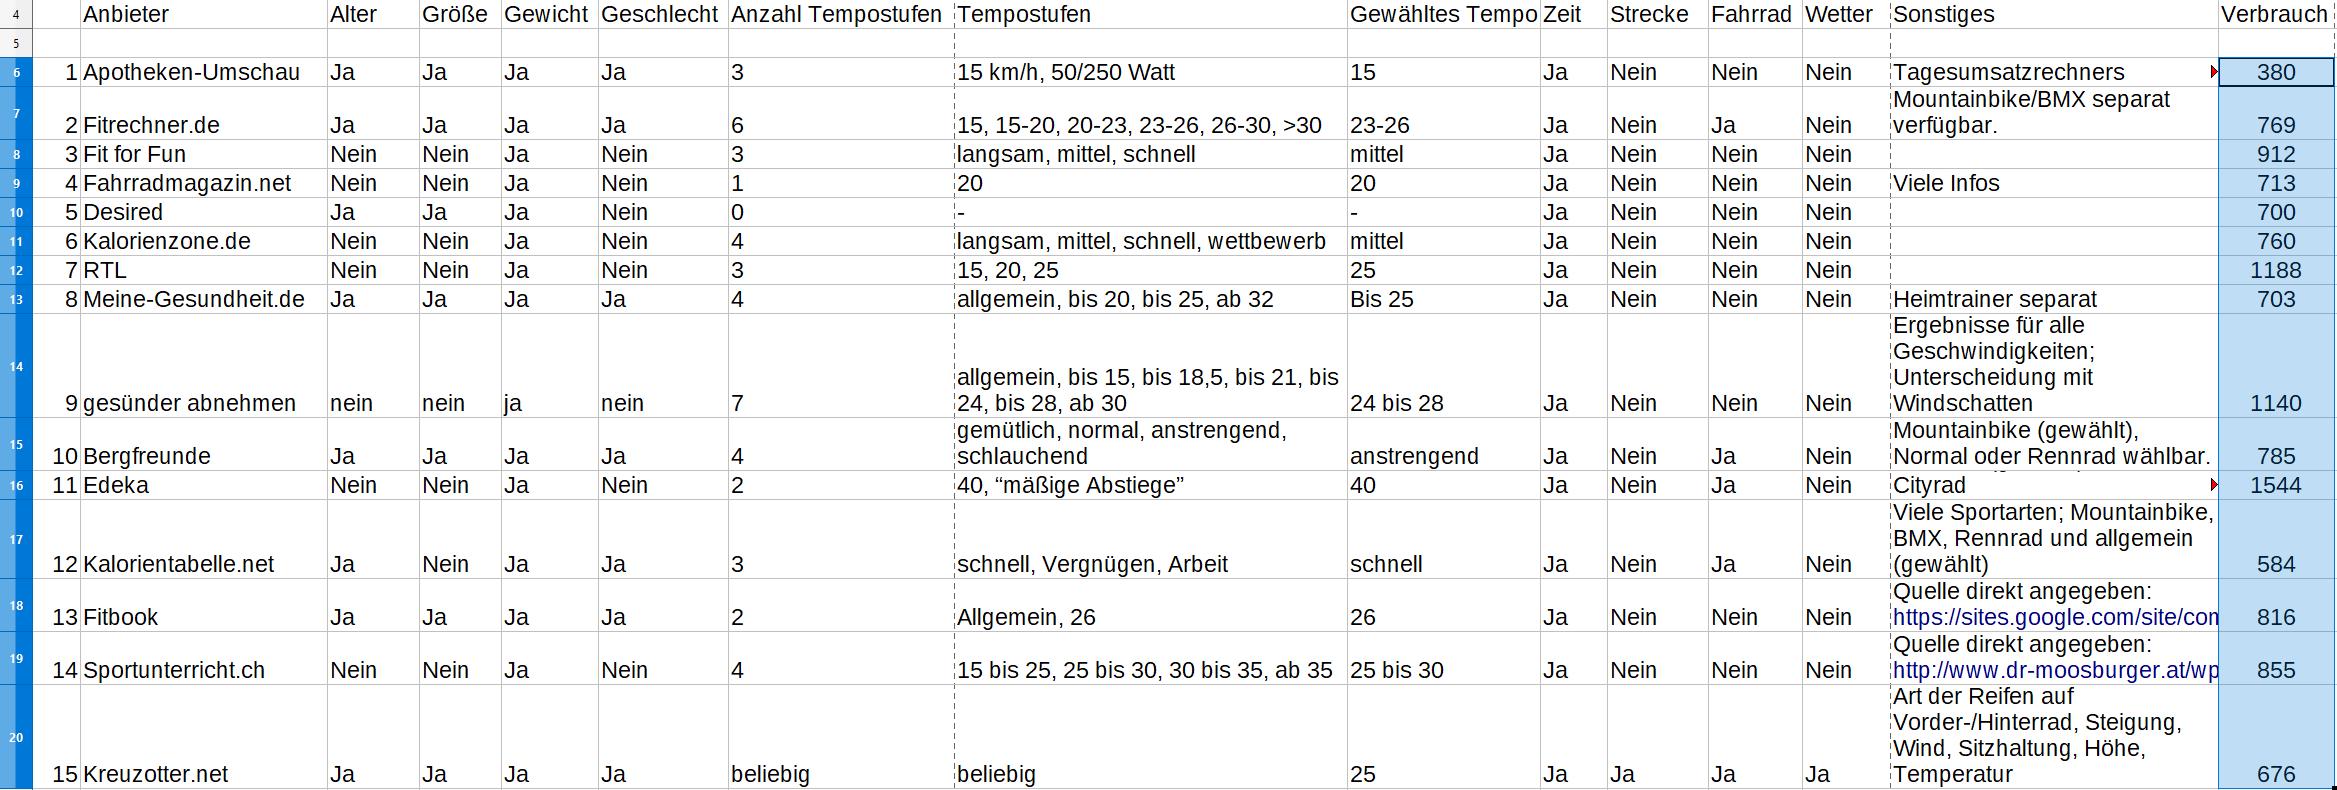 sex kalorien verbrennen tabelle